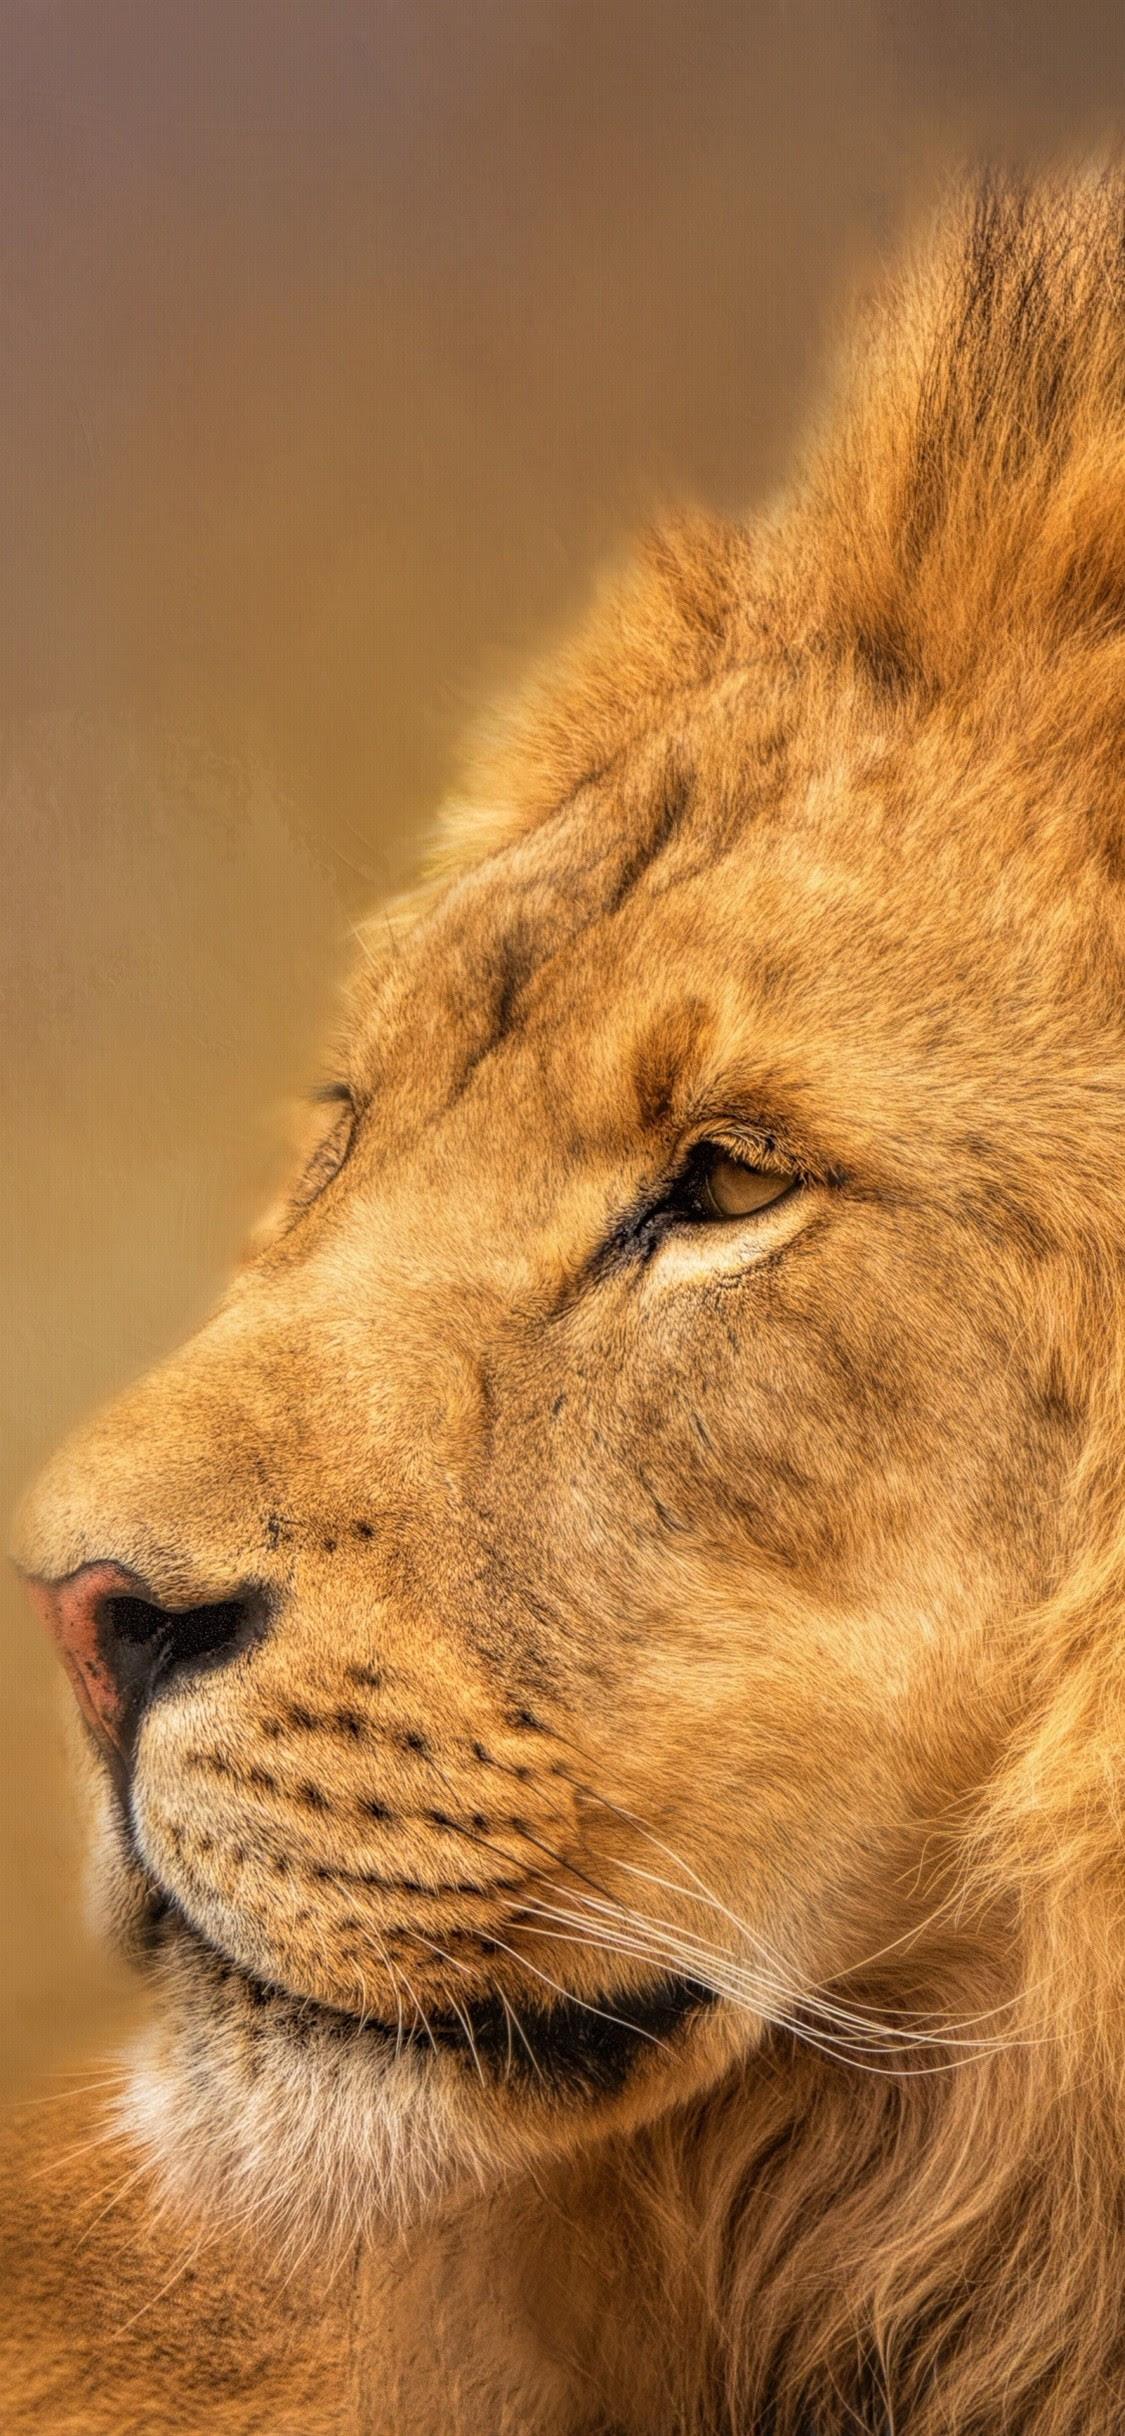 Lion King Wallpapers Free